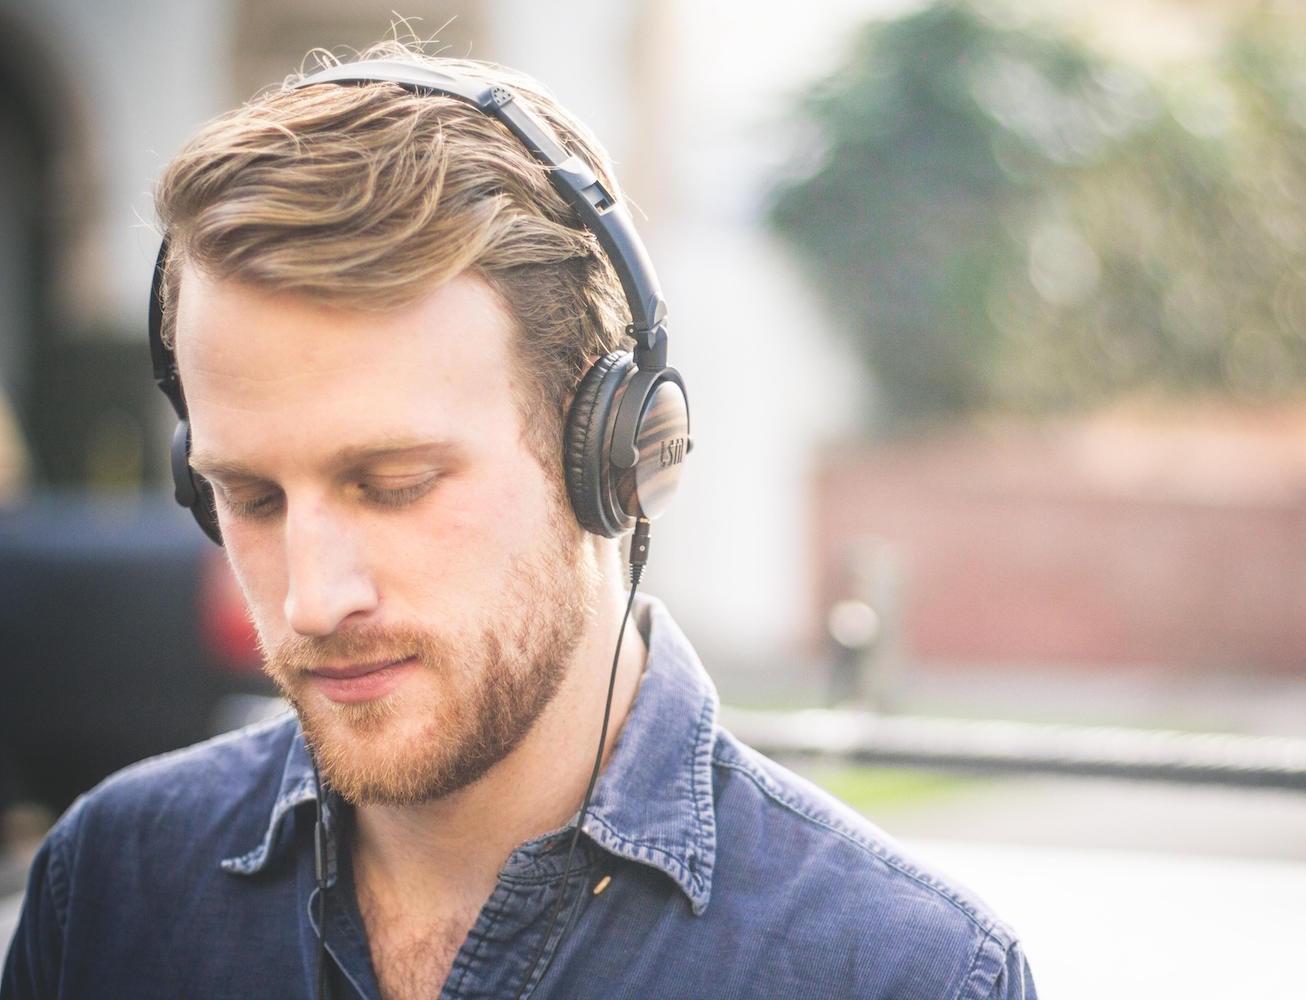 Ebony Wood Fillmores Headphones by LSTN